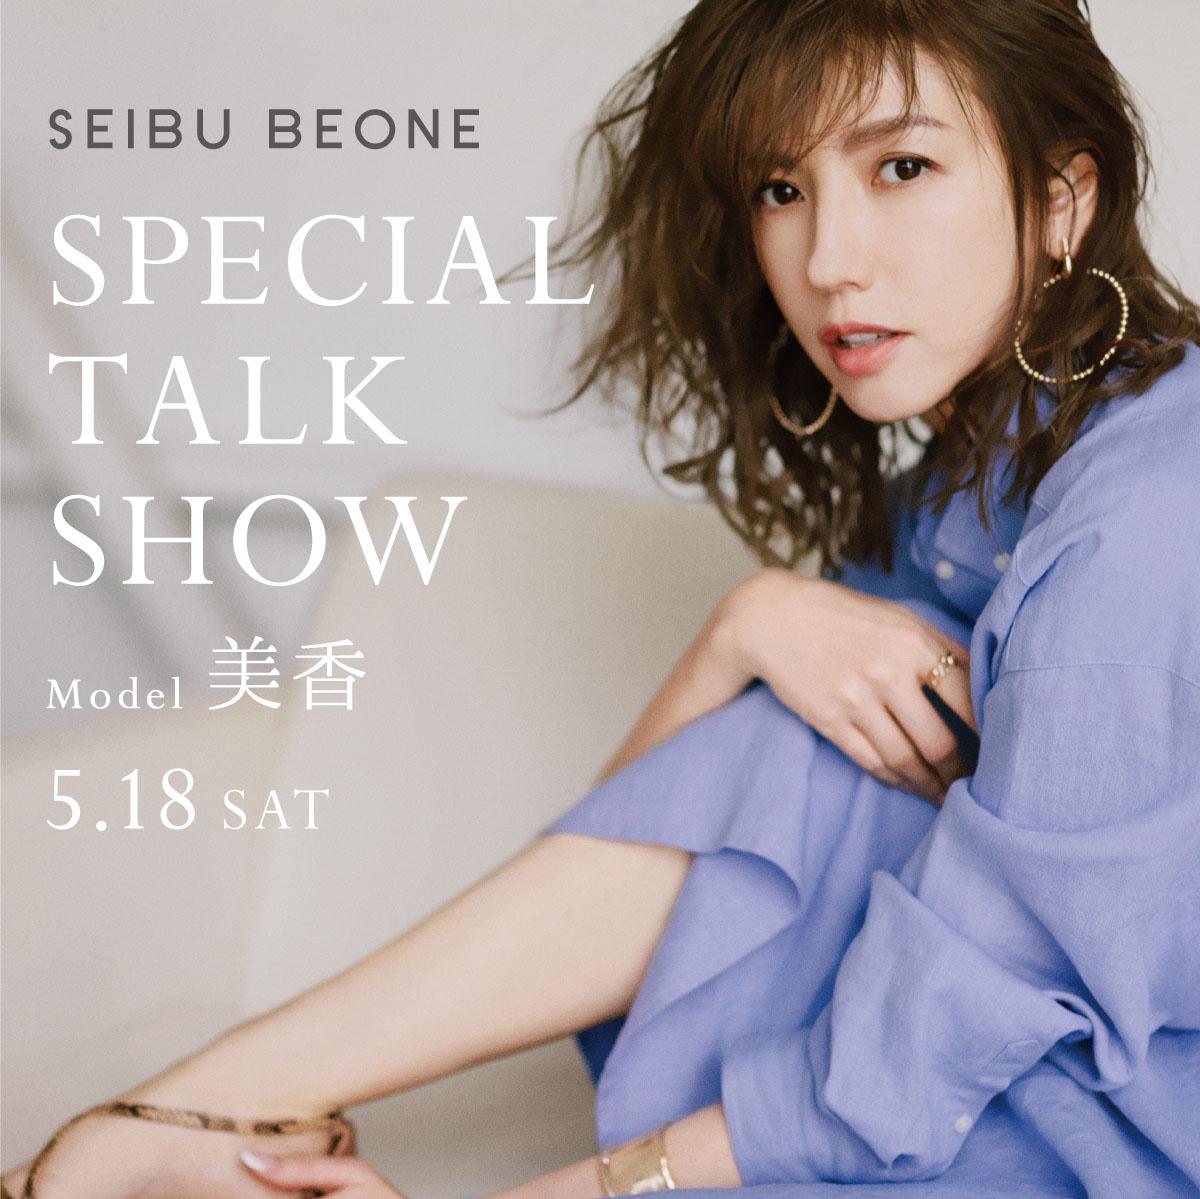 SEIBU BEONE SPECIAL TALK SHOW